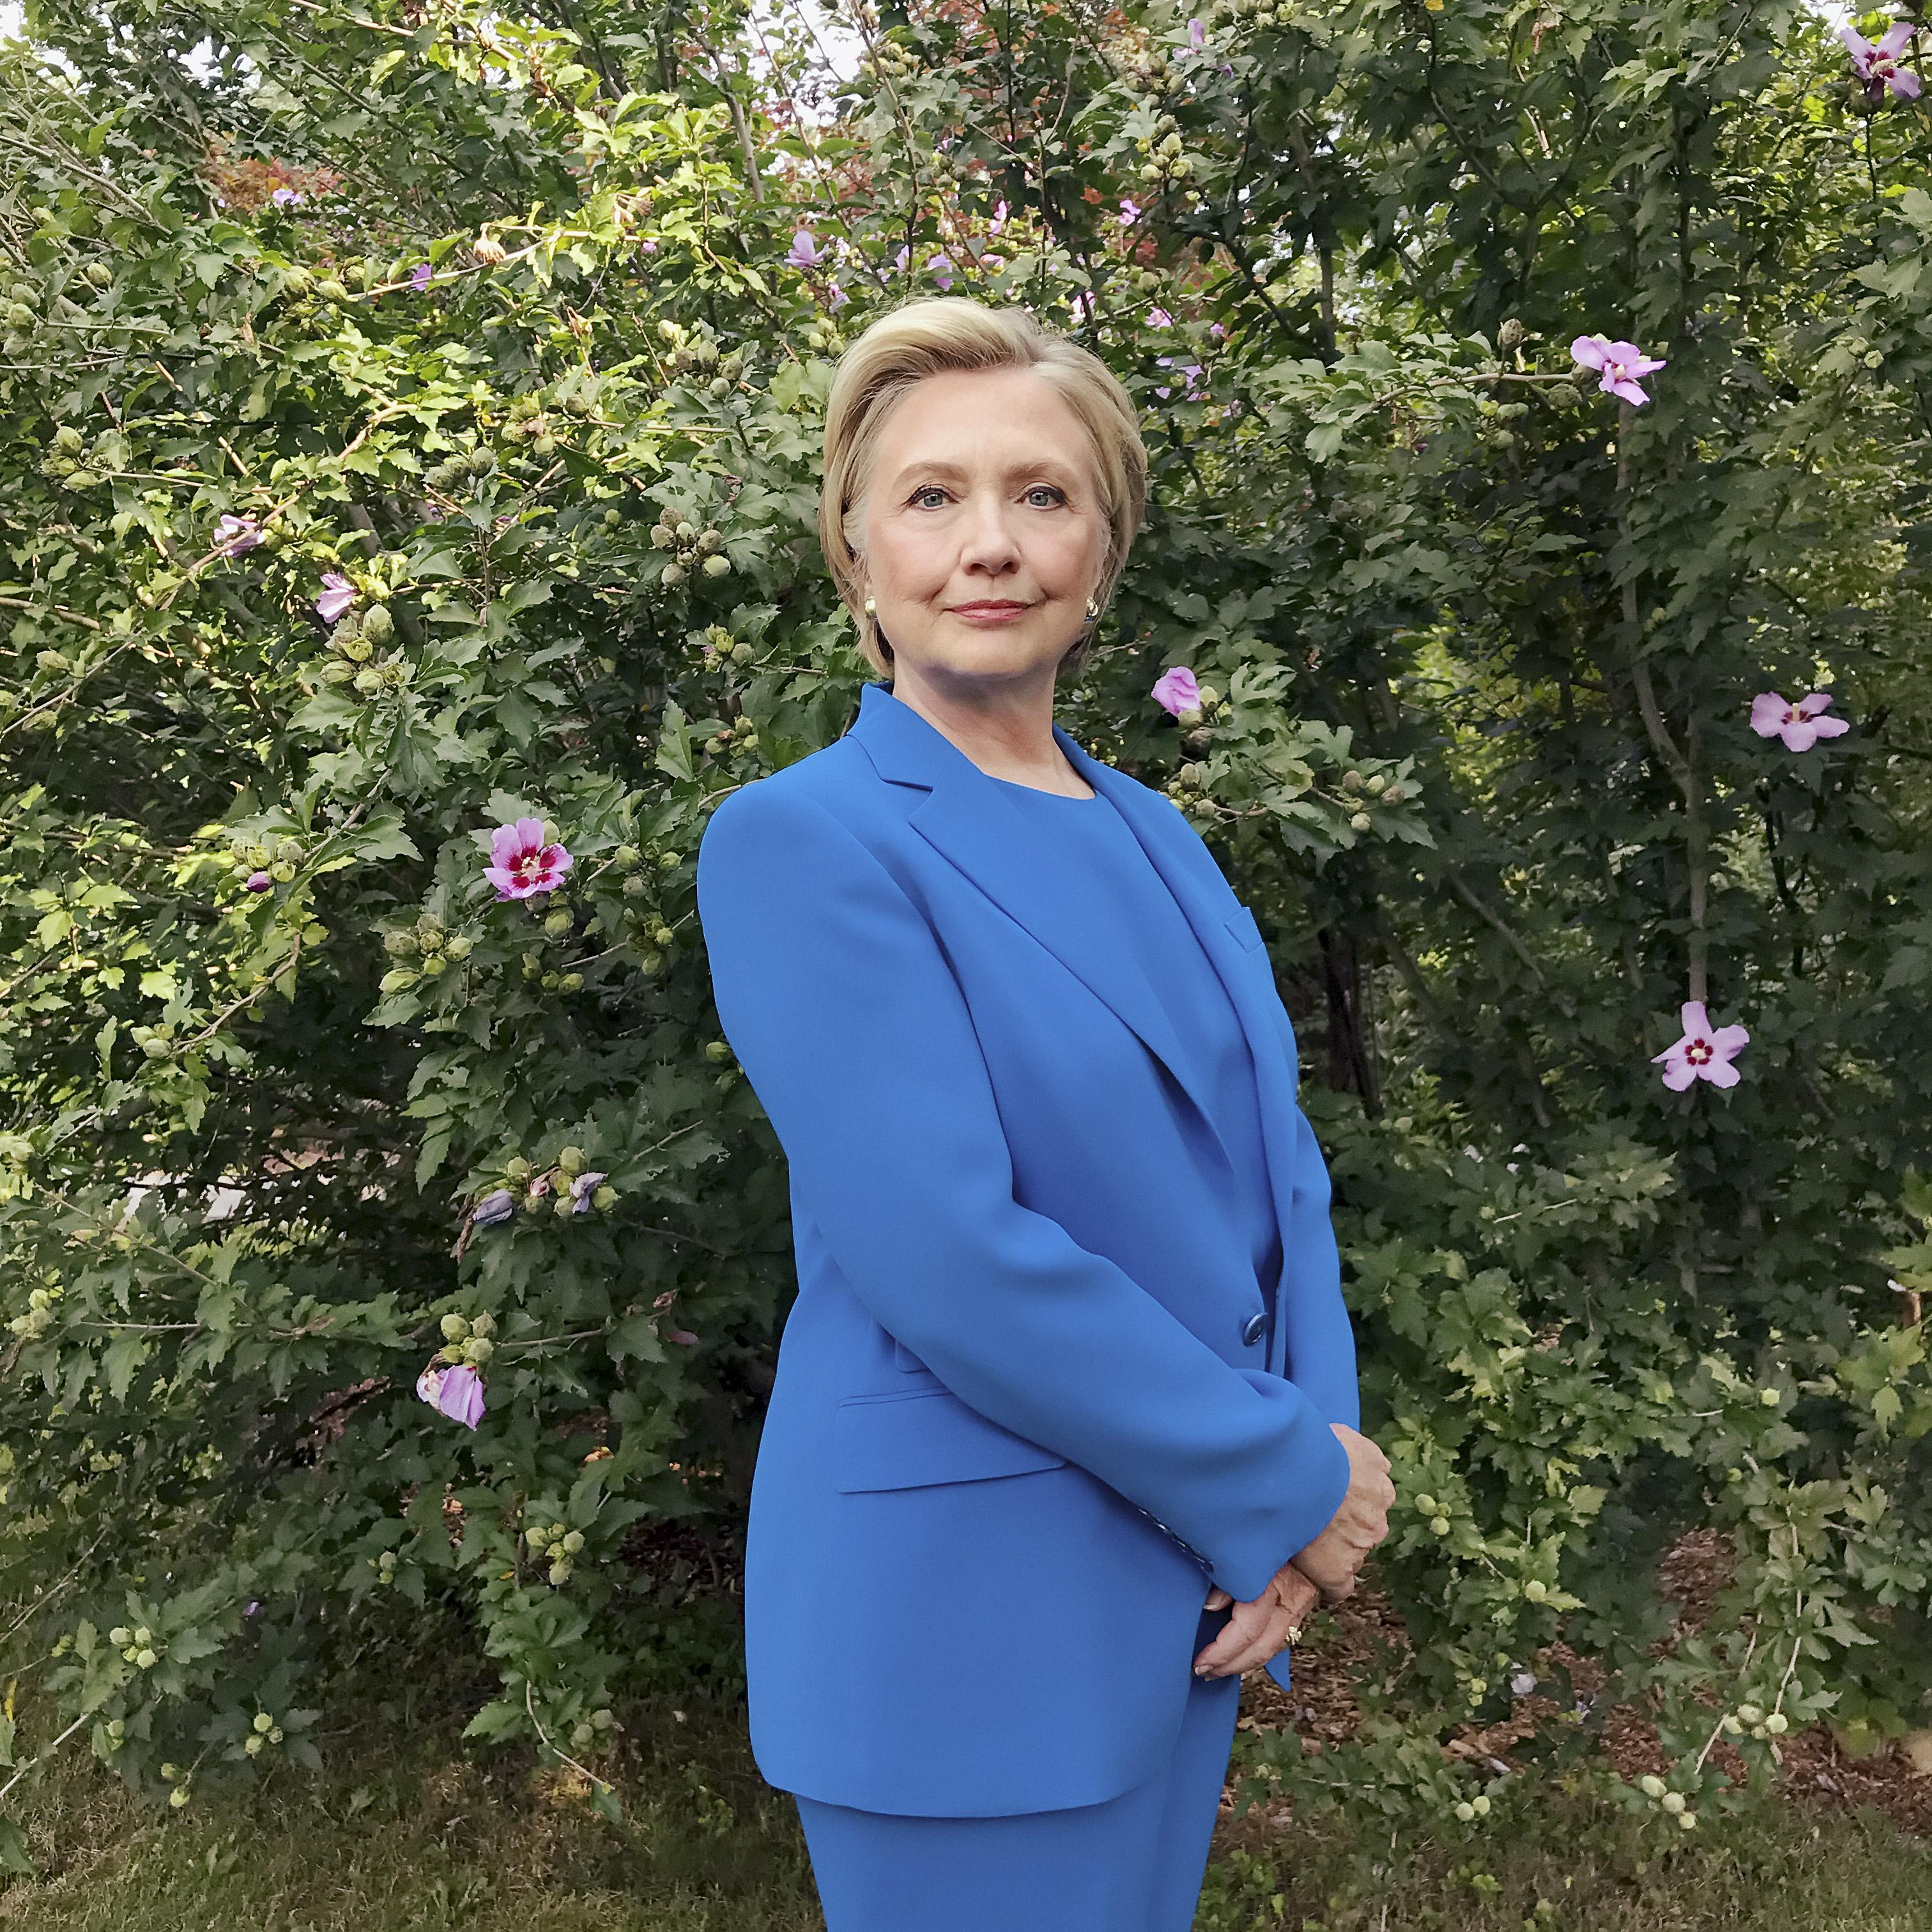 Secretary Hillary Rodham Clinton, photographed in Chappaqua, New York on Sept. 5, 2017.